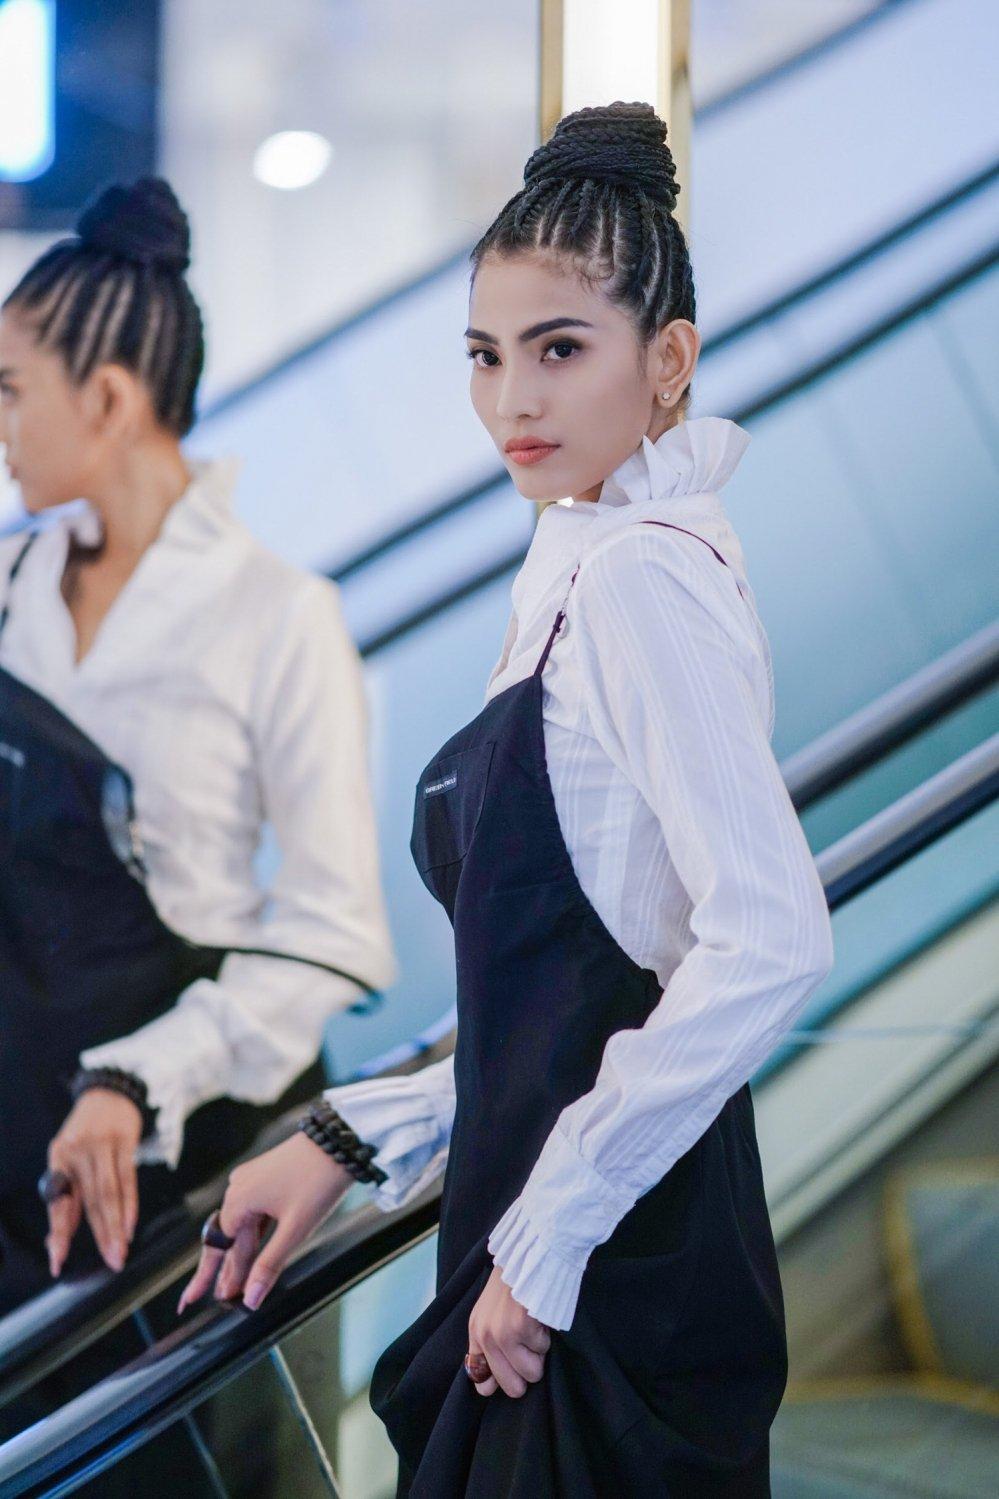 Truong Thi May hoi ngo Paris Hilton, Kate Moss tai Cannes 2018 hinh anh 2